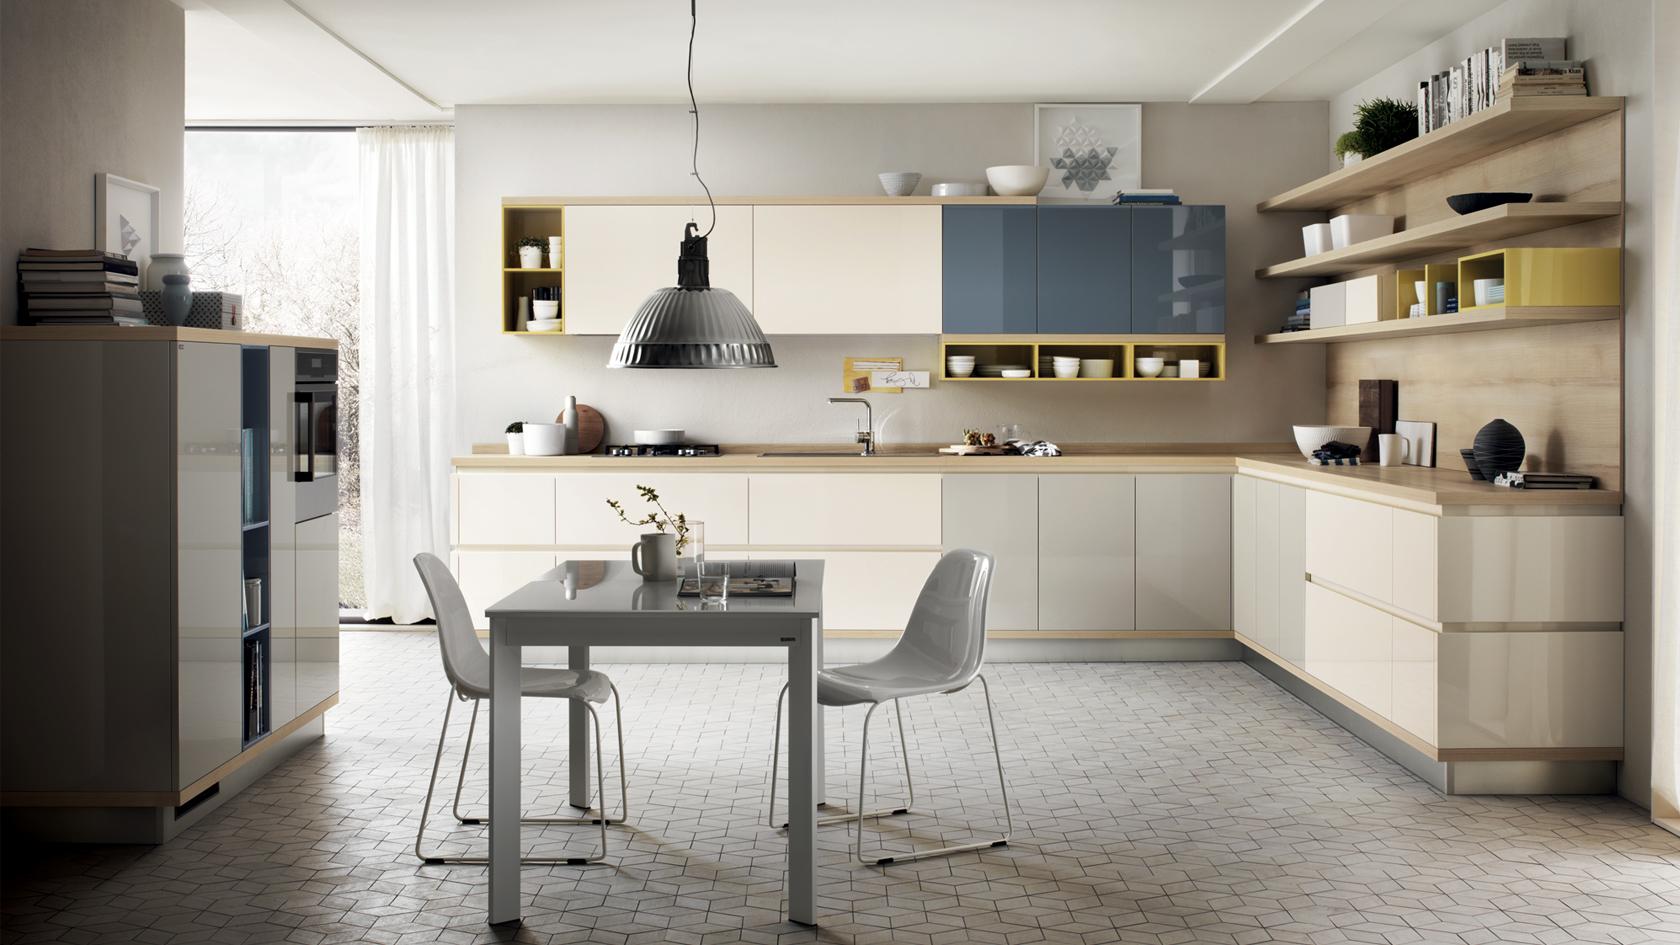 Scavolini foodshelf mobilificio 2000 rieti - Scavolini cucine moderne ...